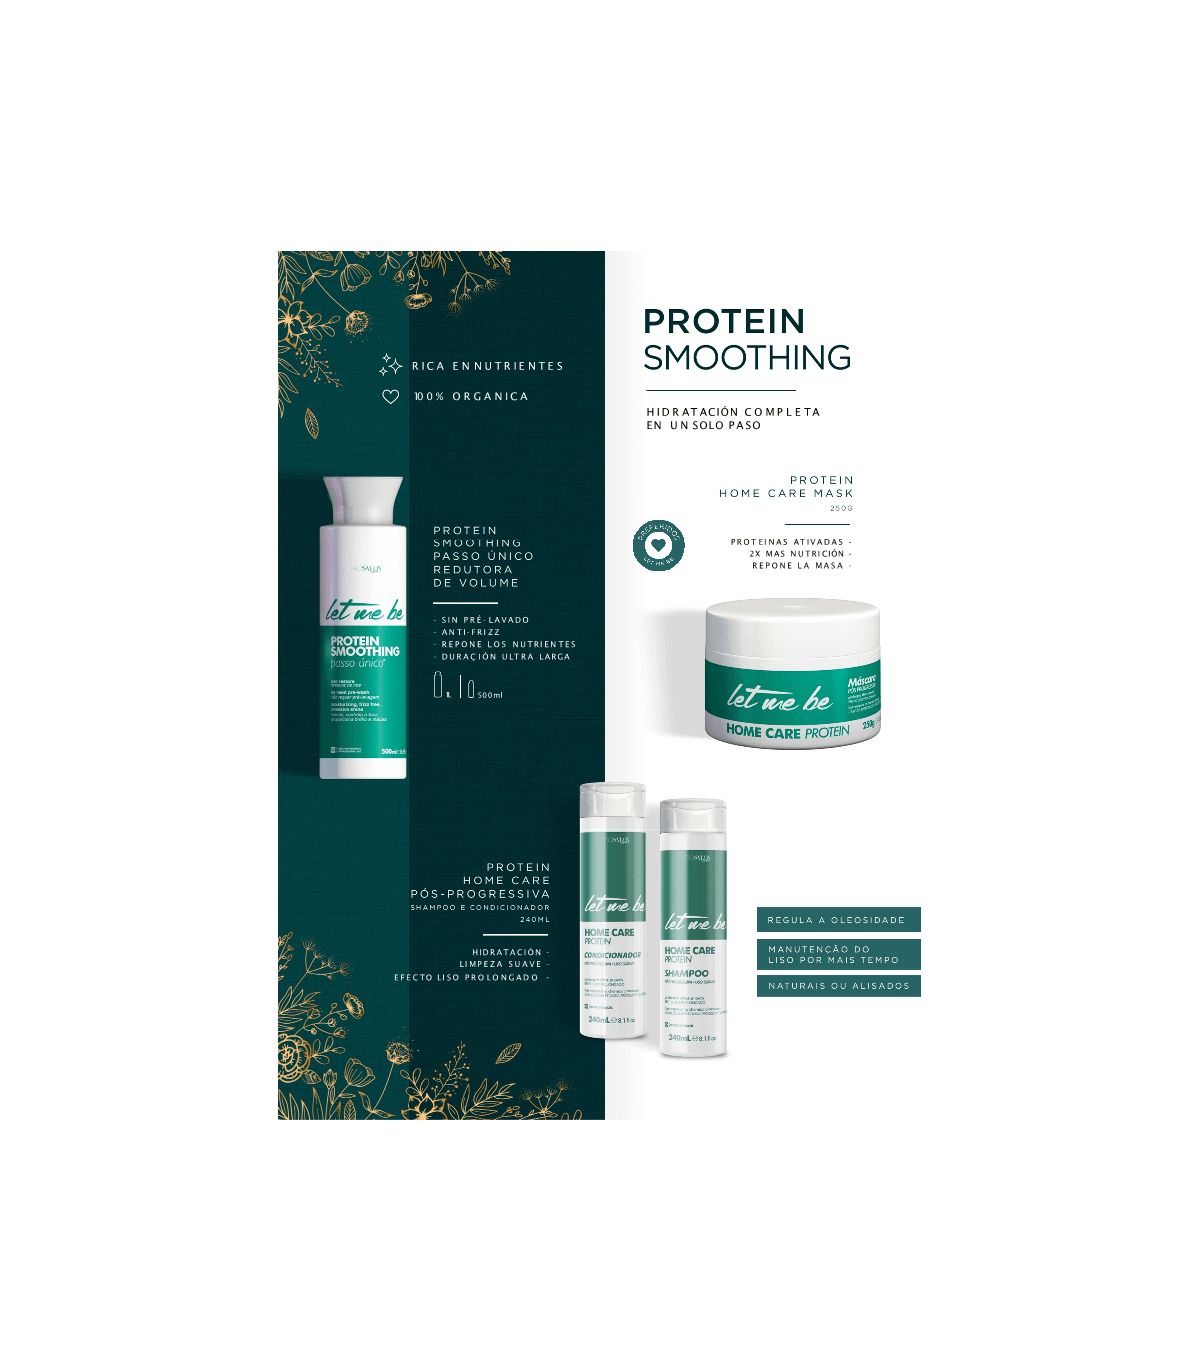 Champu Smooting protein Letmebe 240ml